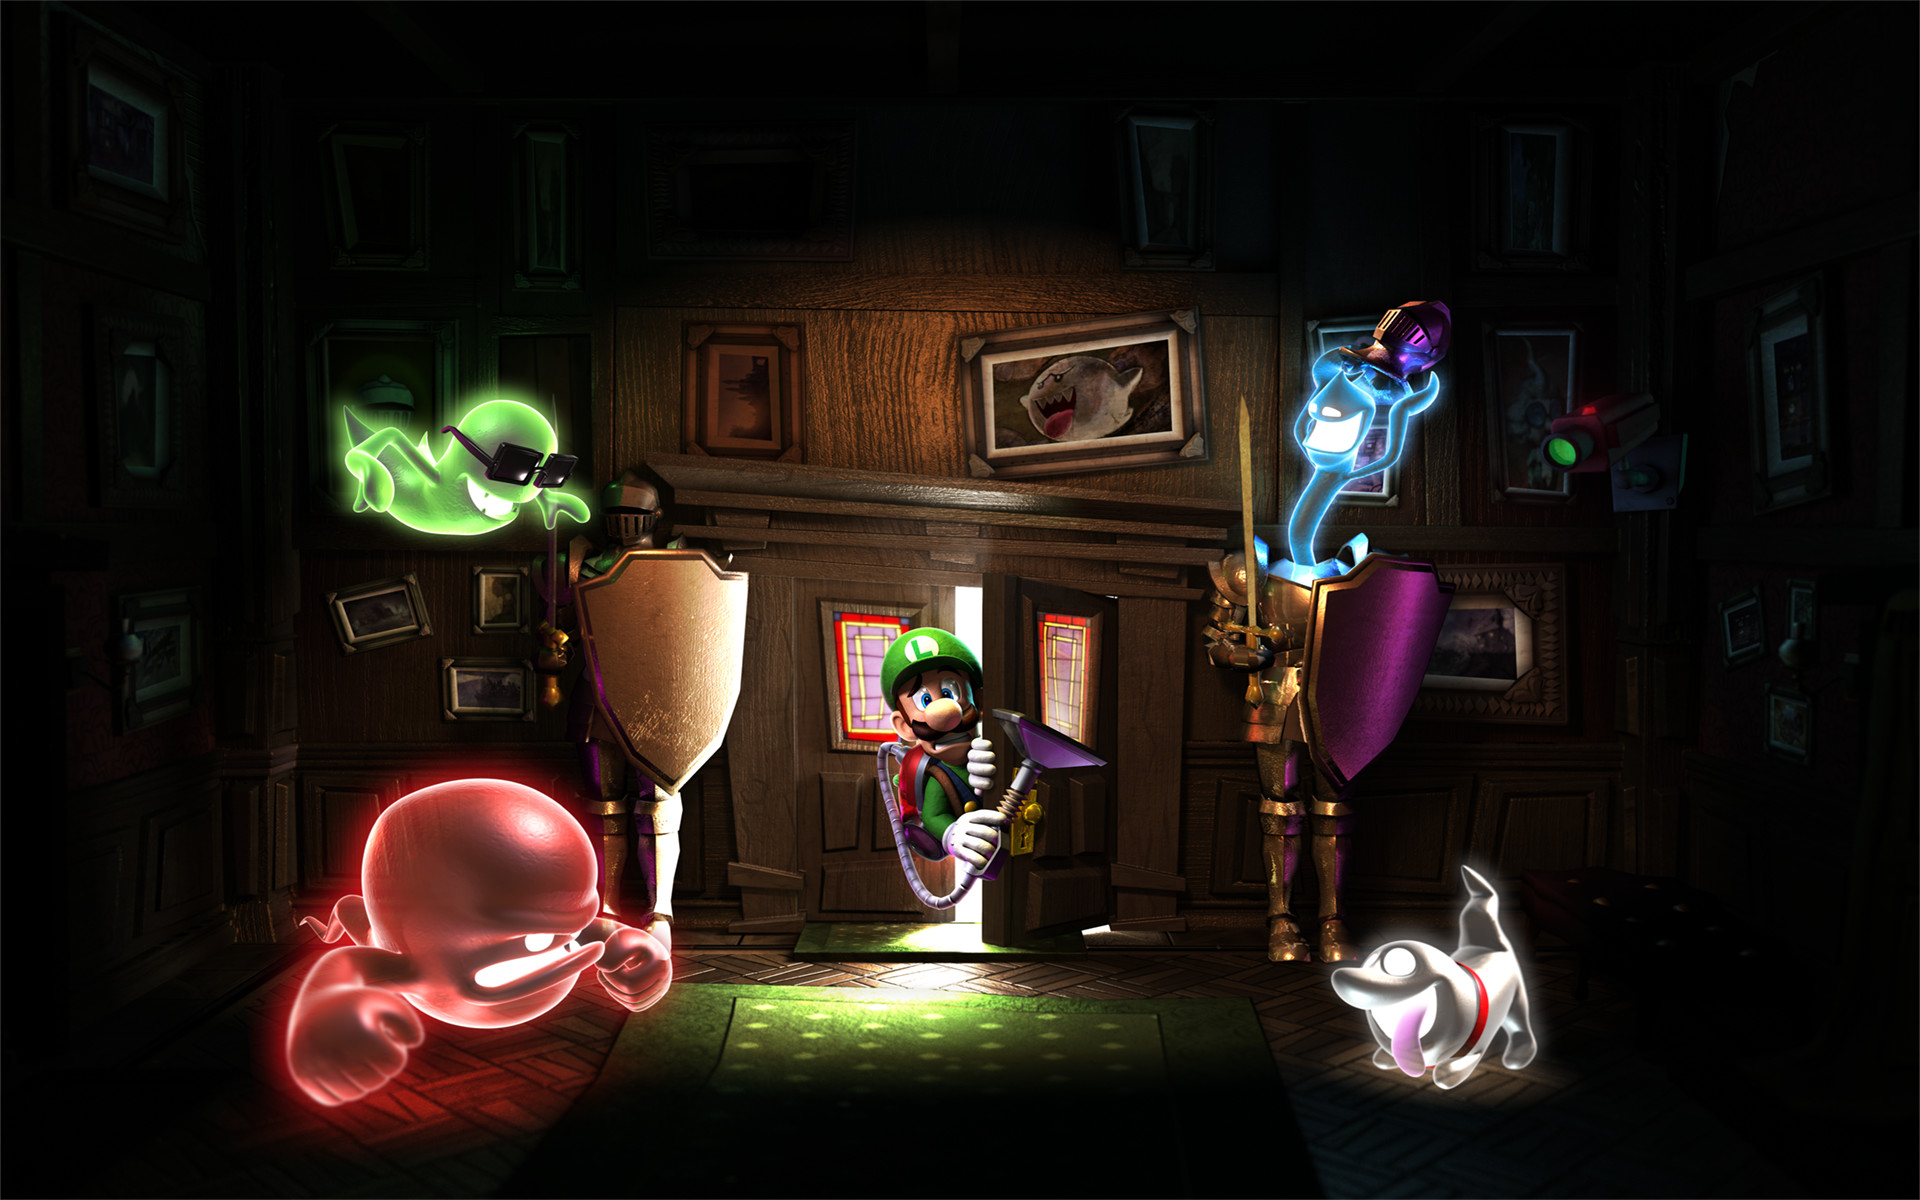 Luigis-Mansion-Dark-Moon-2013-3DS-Game-HD-Wallpapers-01